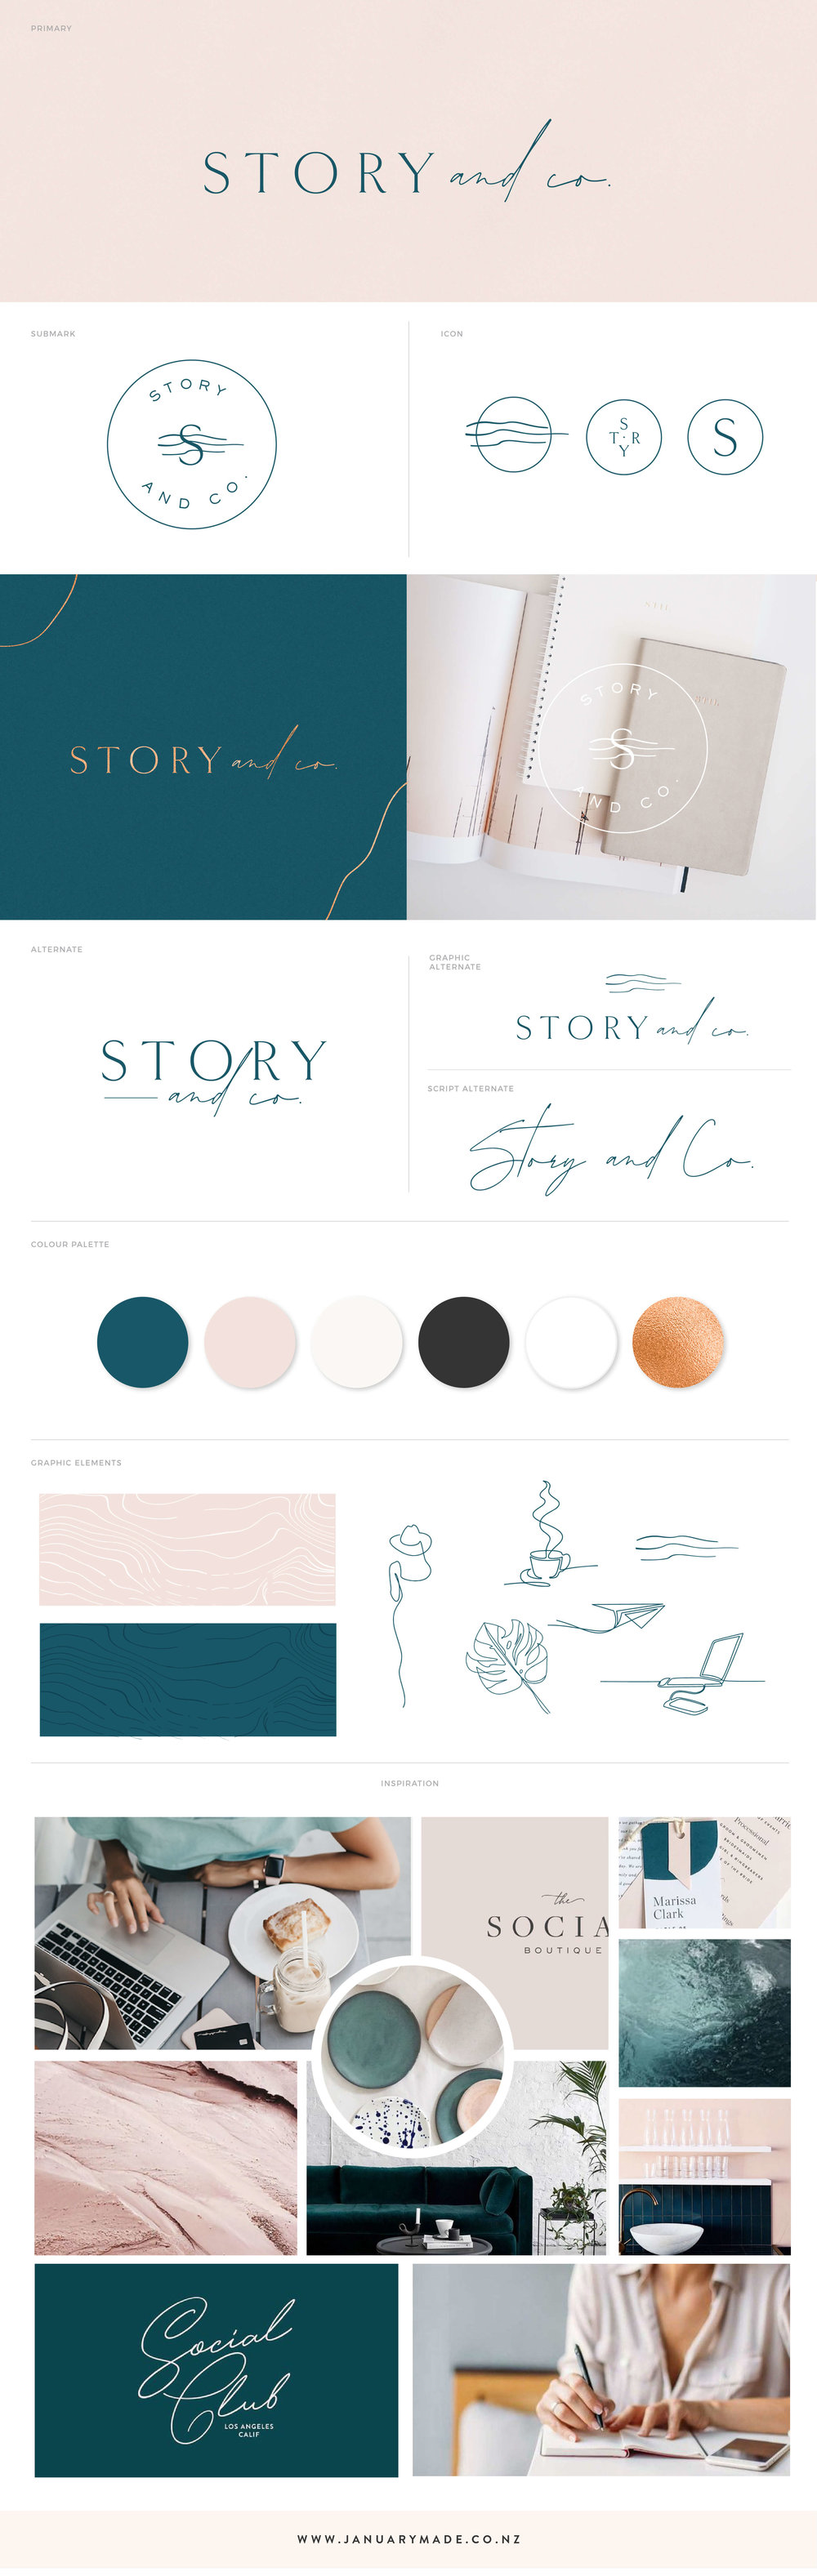 Story & Co. - January Made Design